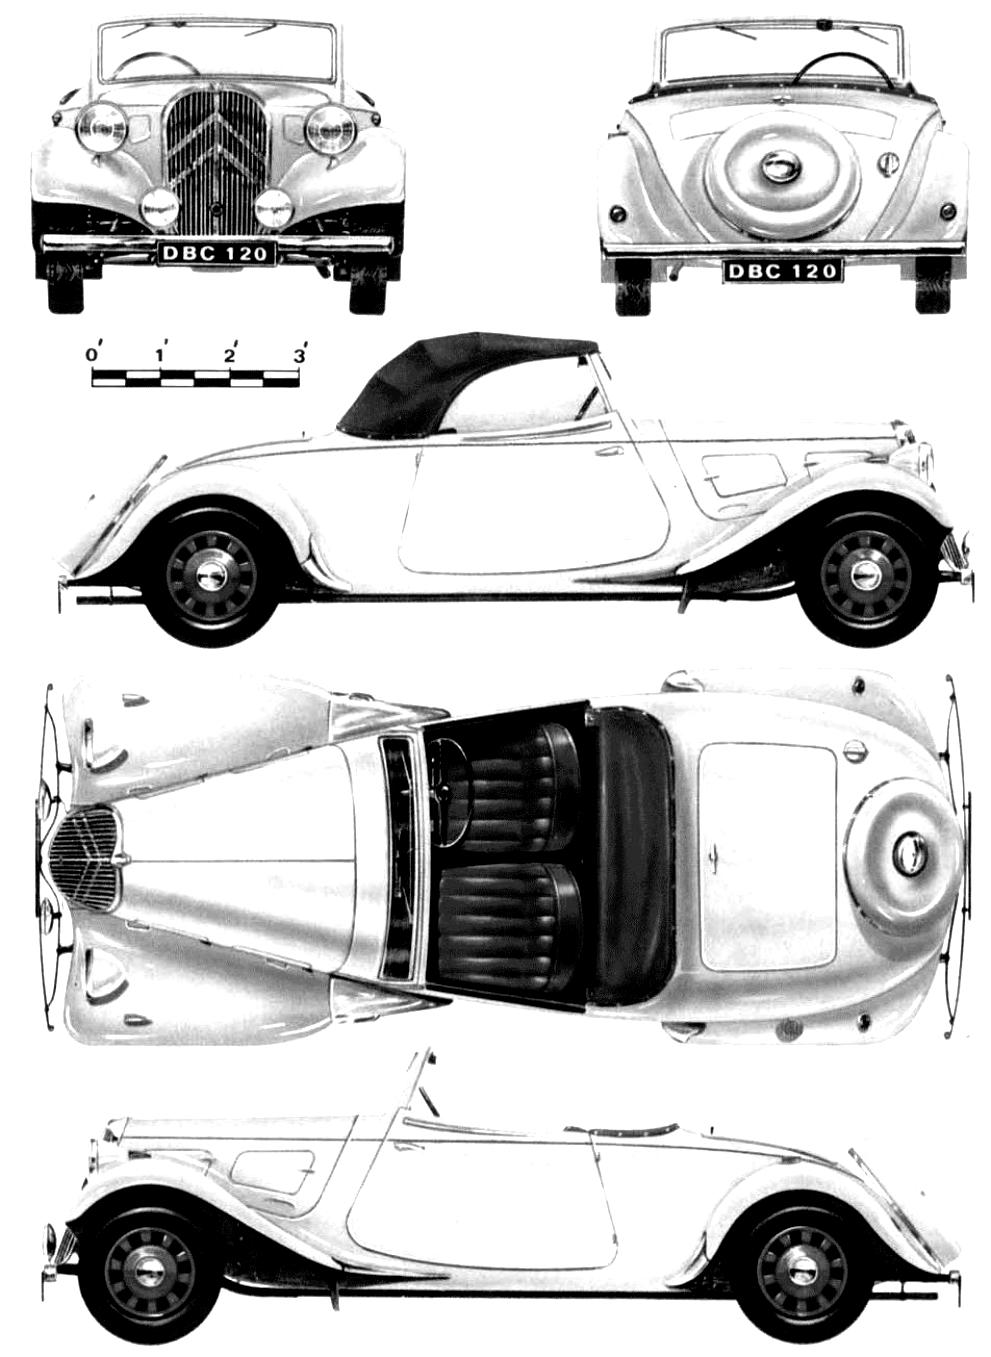 Citroen Traction 7 S Roadster 1934 on MotoImg.com